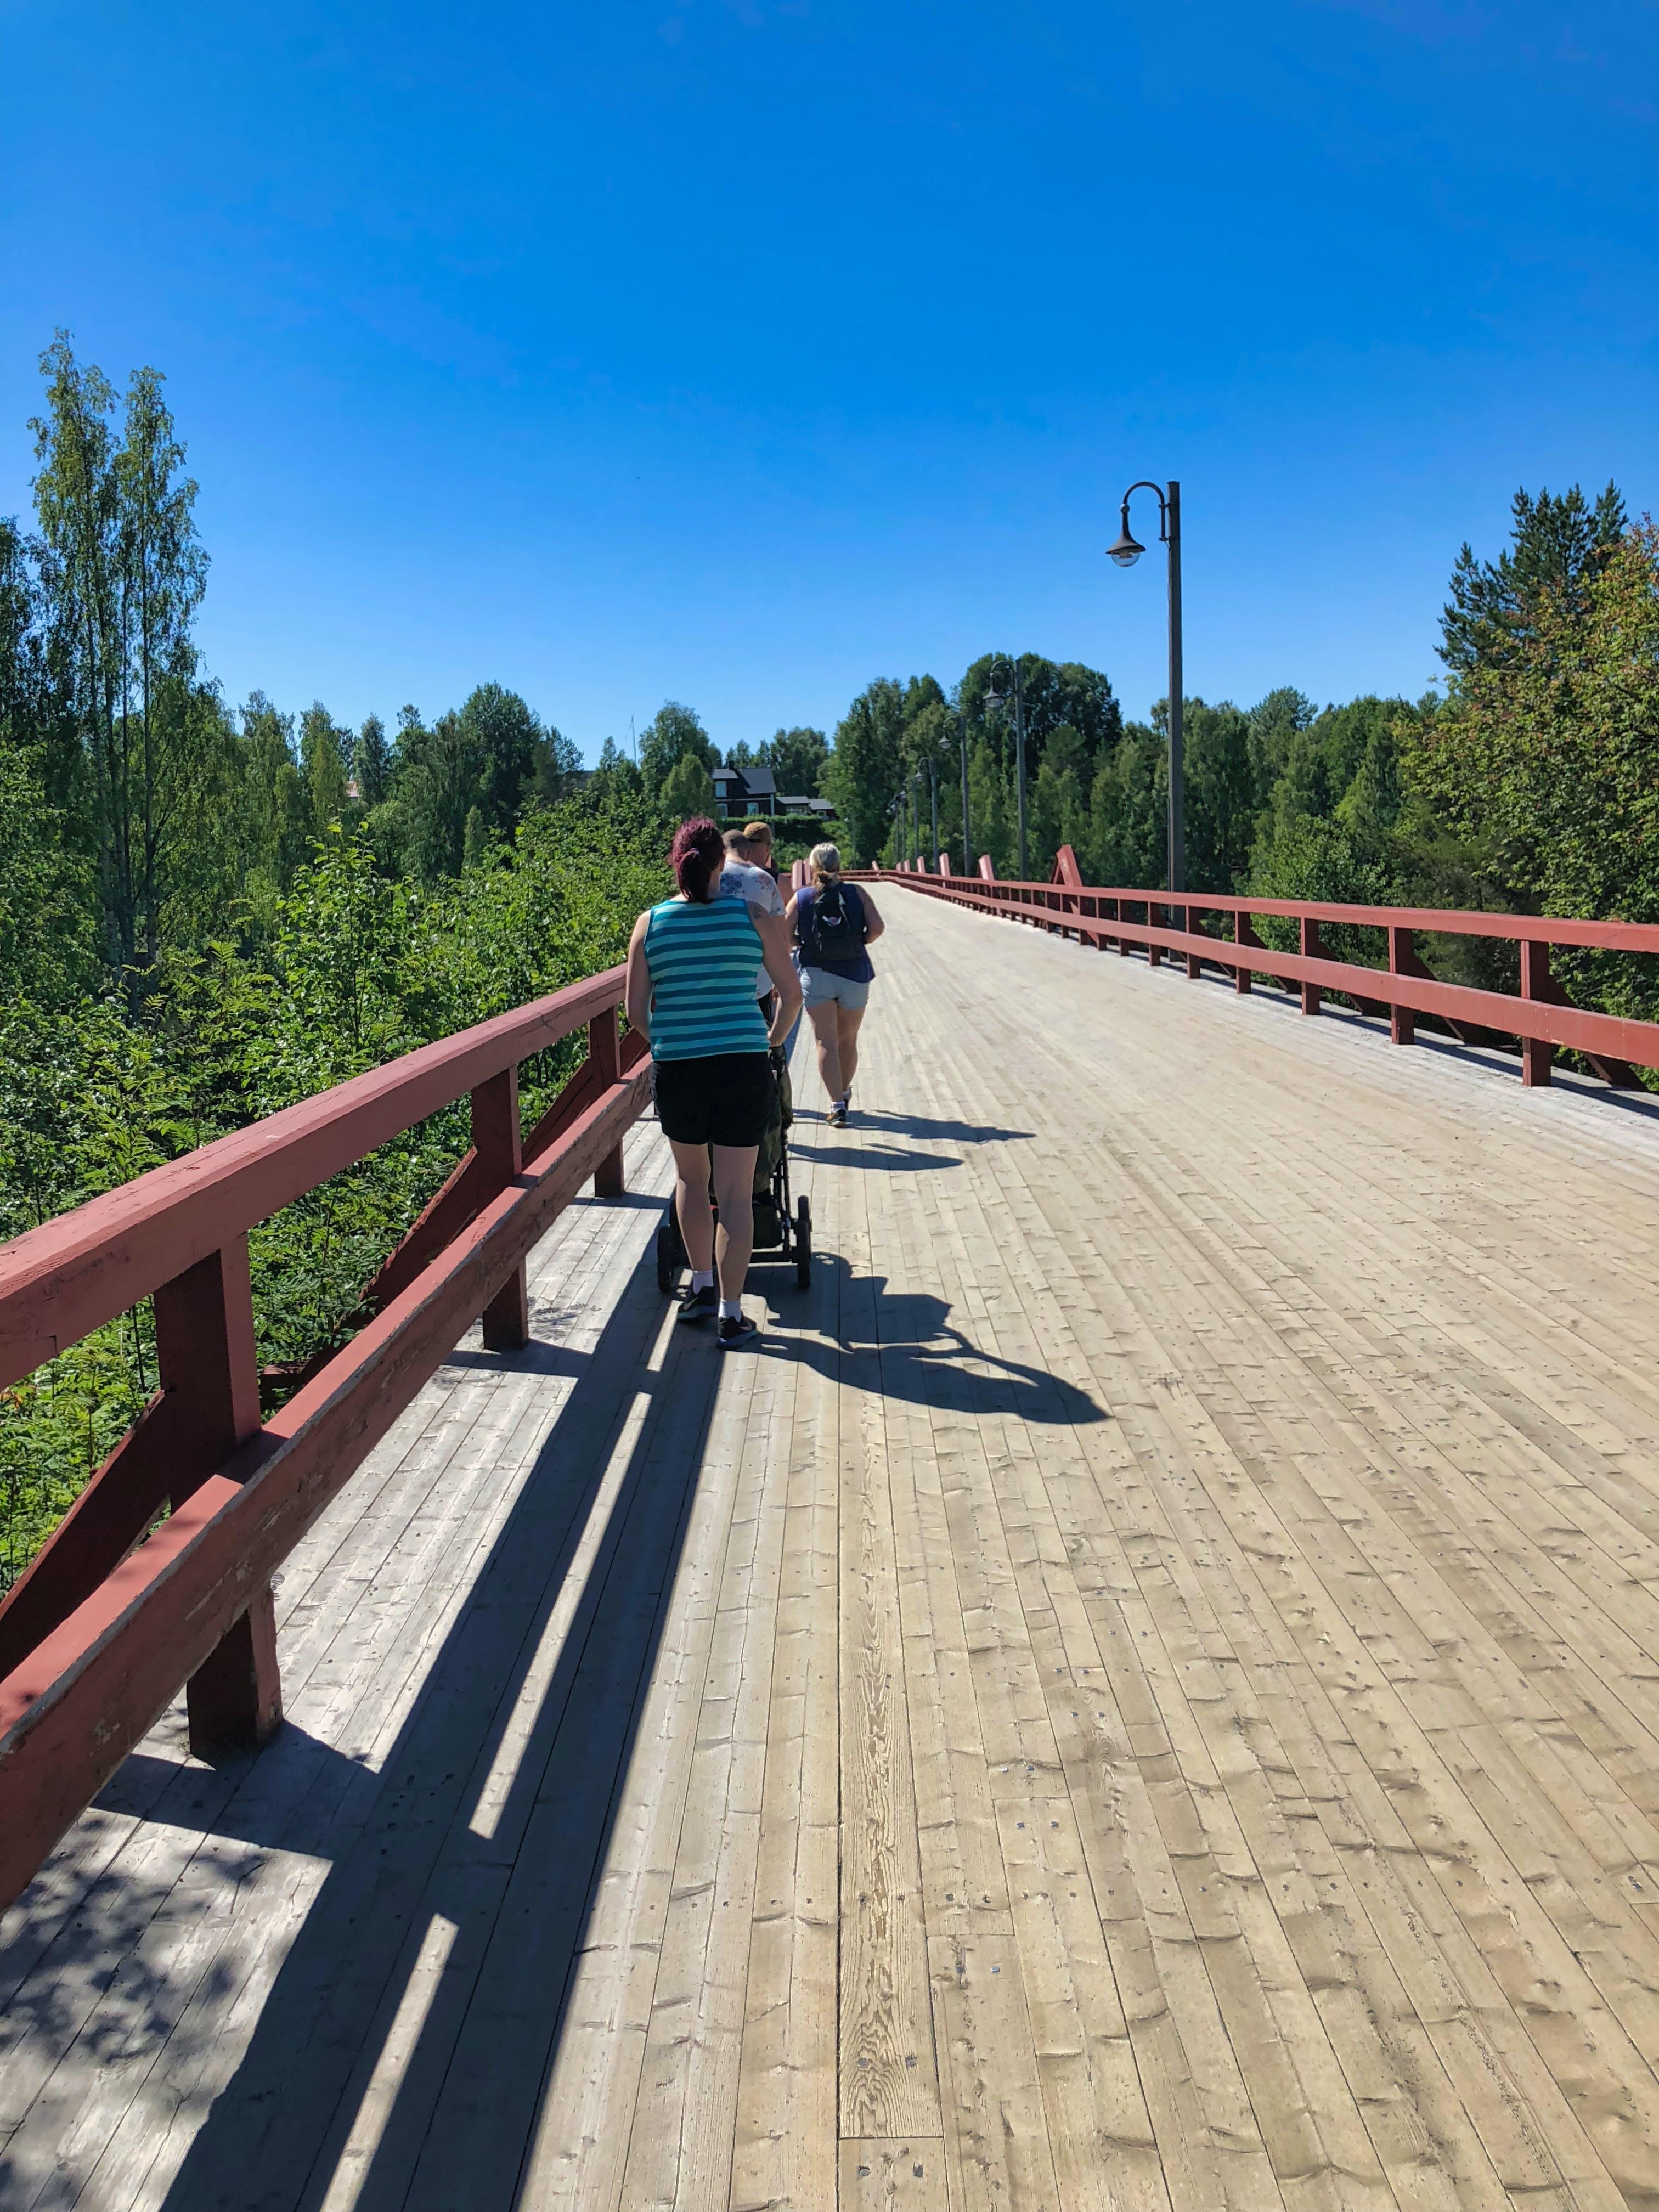 Free stock photo of bridge, people walking, wood